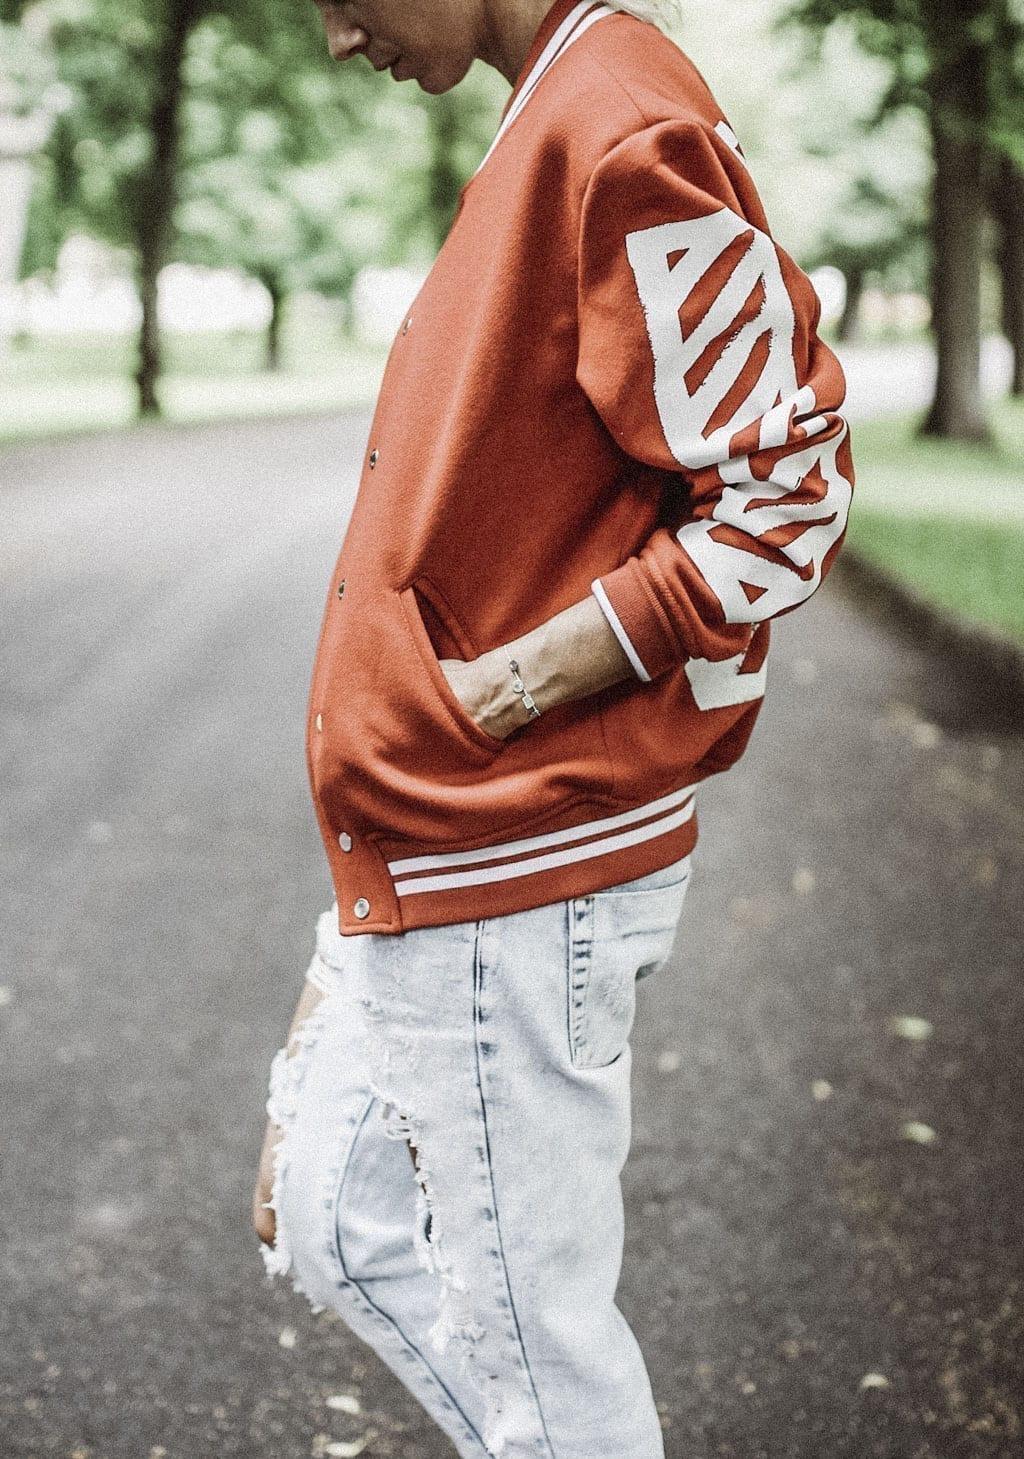 Constantly-K-karin-kaswurm-white-red-rieger-jacket-salzburg-fashion-street-style-9071